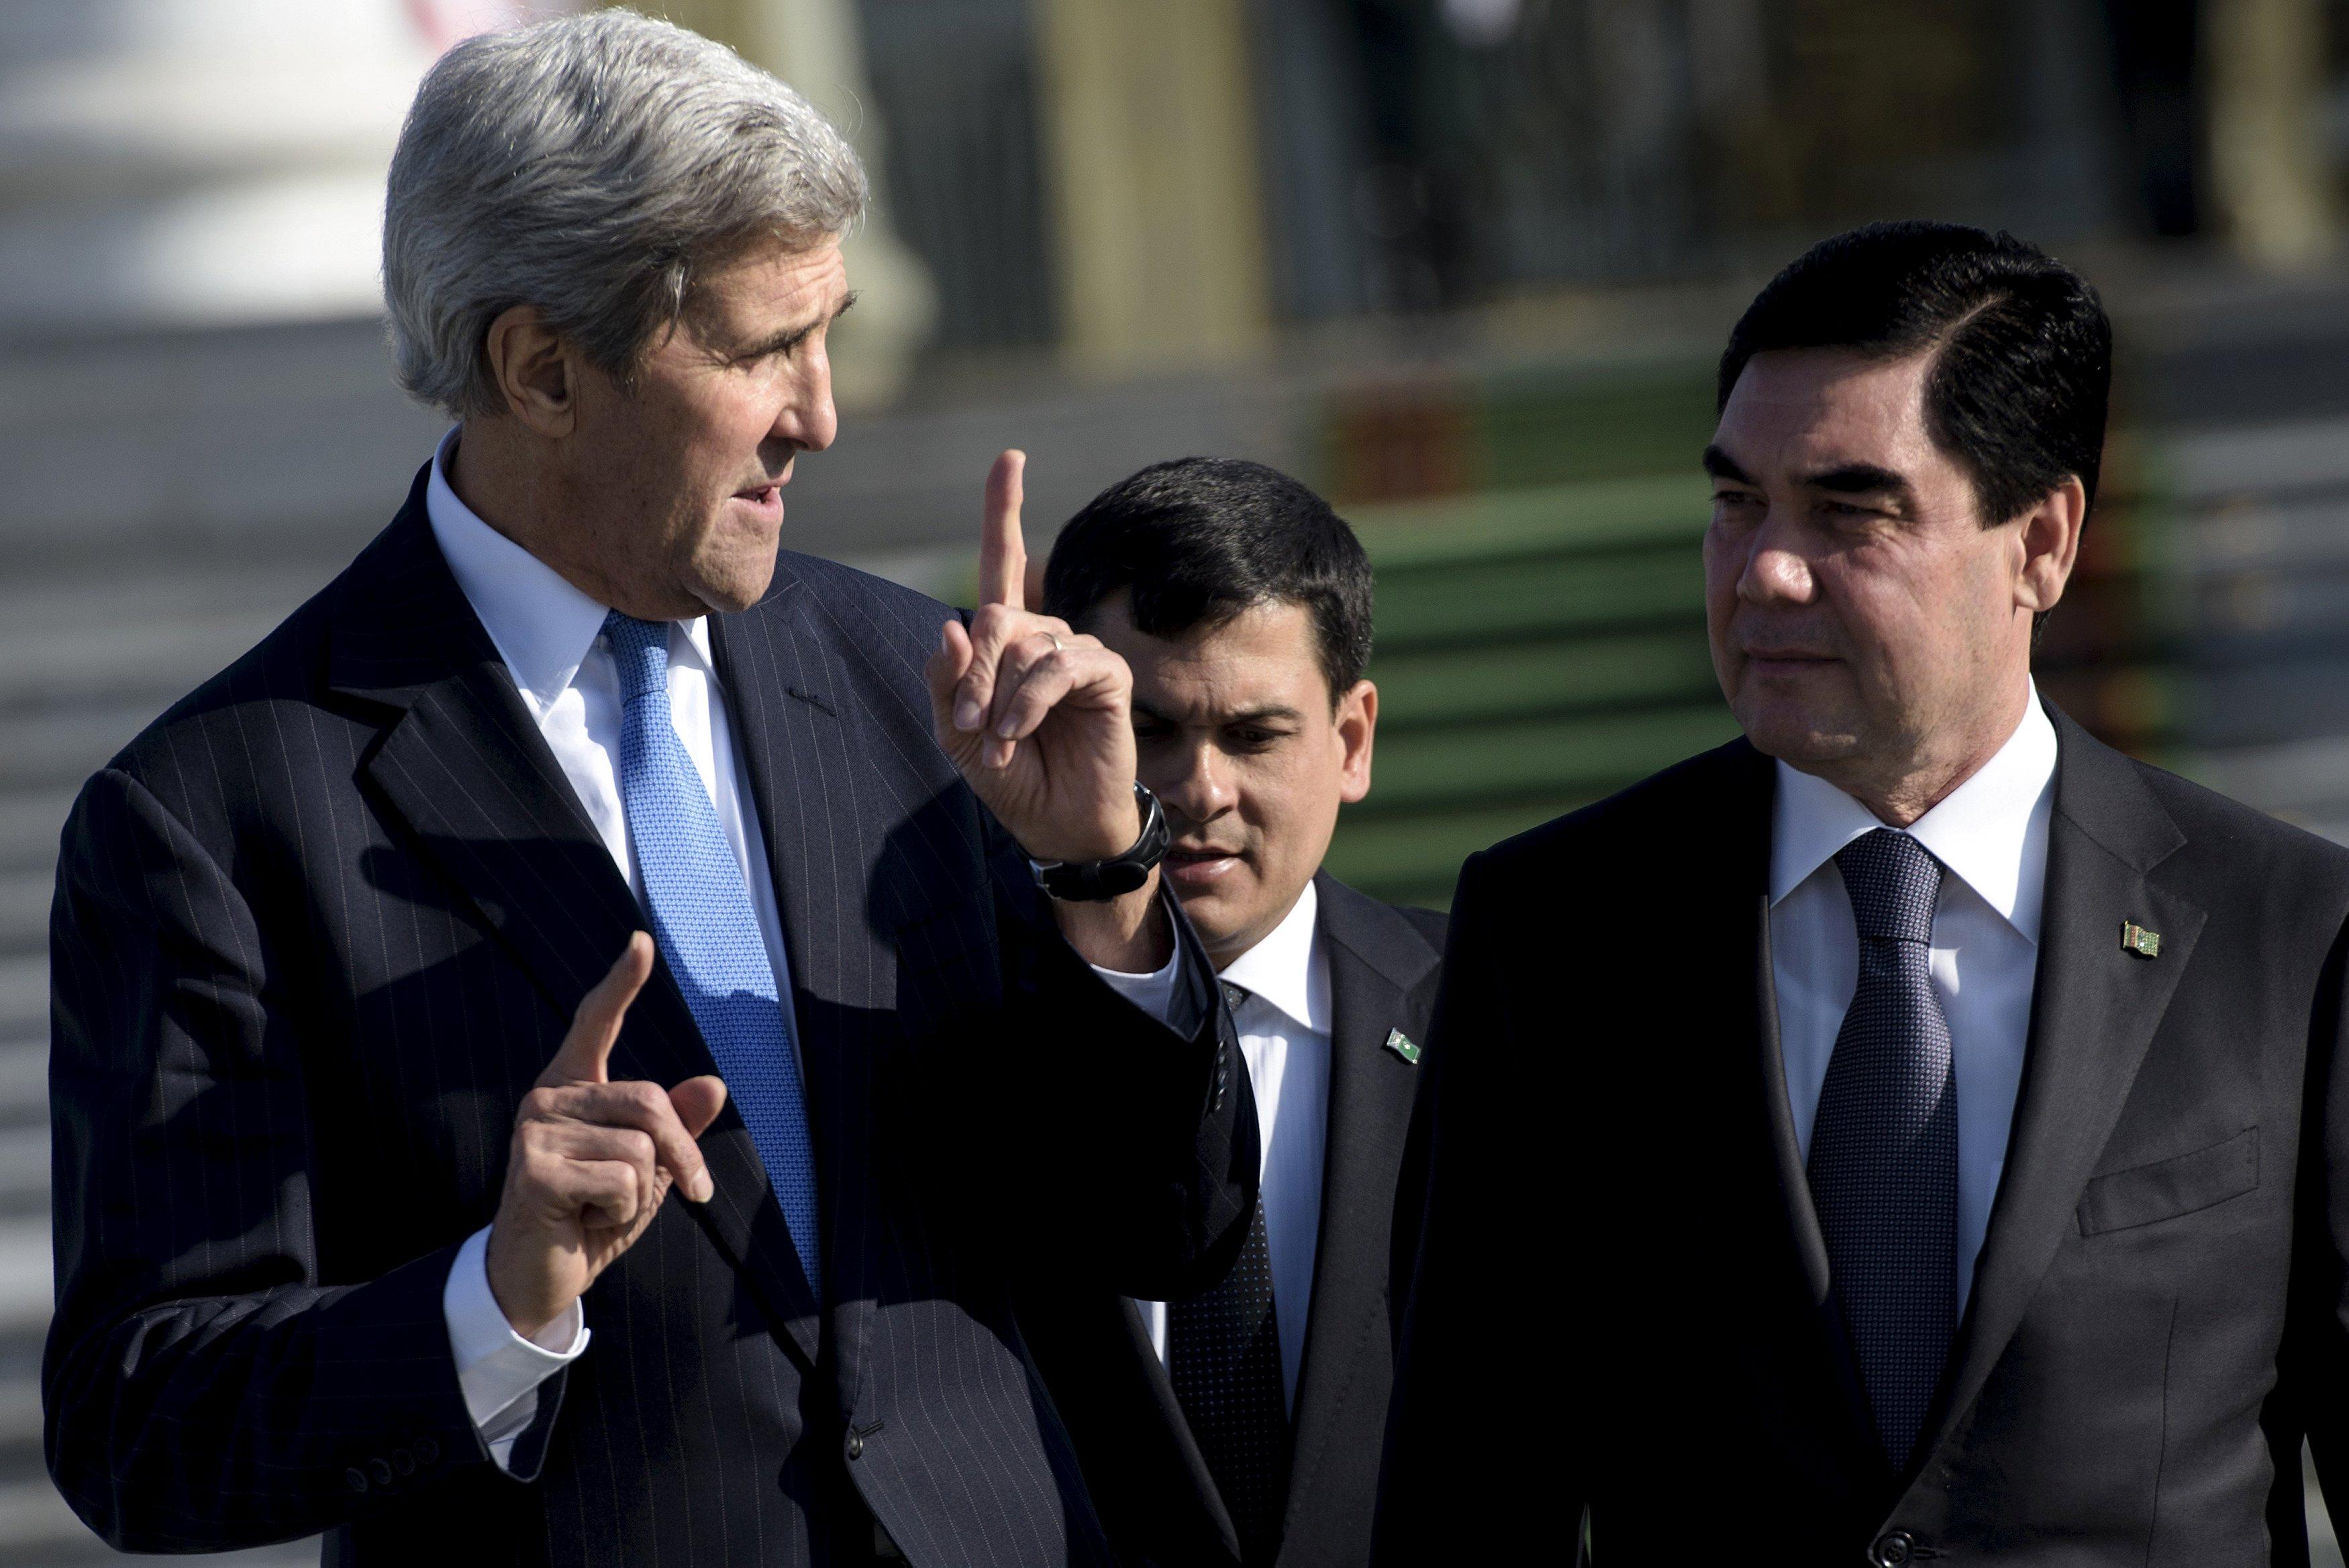 Menteri Luar Negeri John Kerry (kiri) dan Presiden Turkmenistan Gurbanguly Berdimuhamedov (kanan) berjalan setelah pertemuan di Istana Kepresidenan Oguzkan di Ashgabat, Selasa (3/11). Kerry mengunjungi Tajikistan dan Turkmenistan pada hari terakhir perjalanannya mengunjungi lima negara Asia Tengah. REUTERS/Brendan Smialowski.